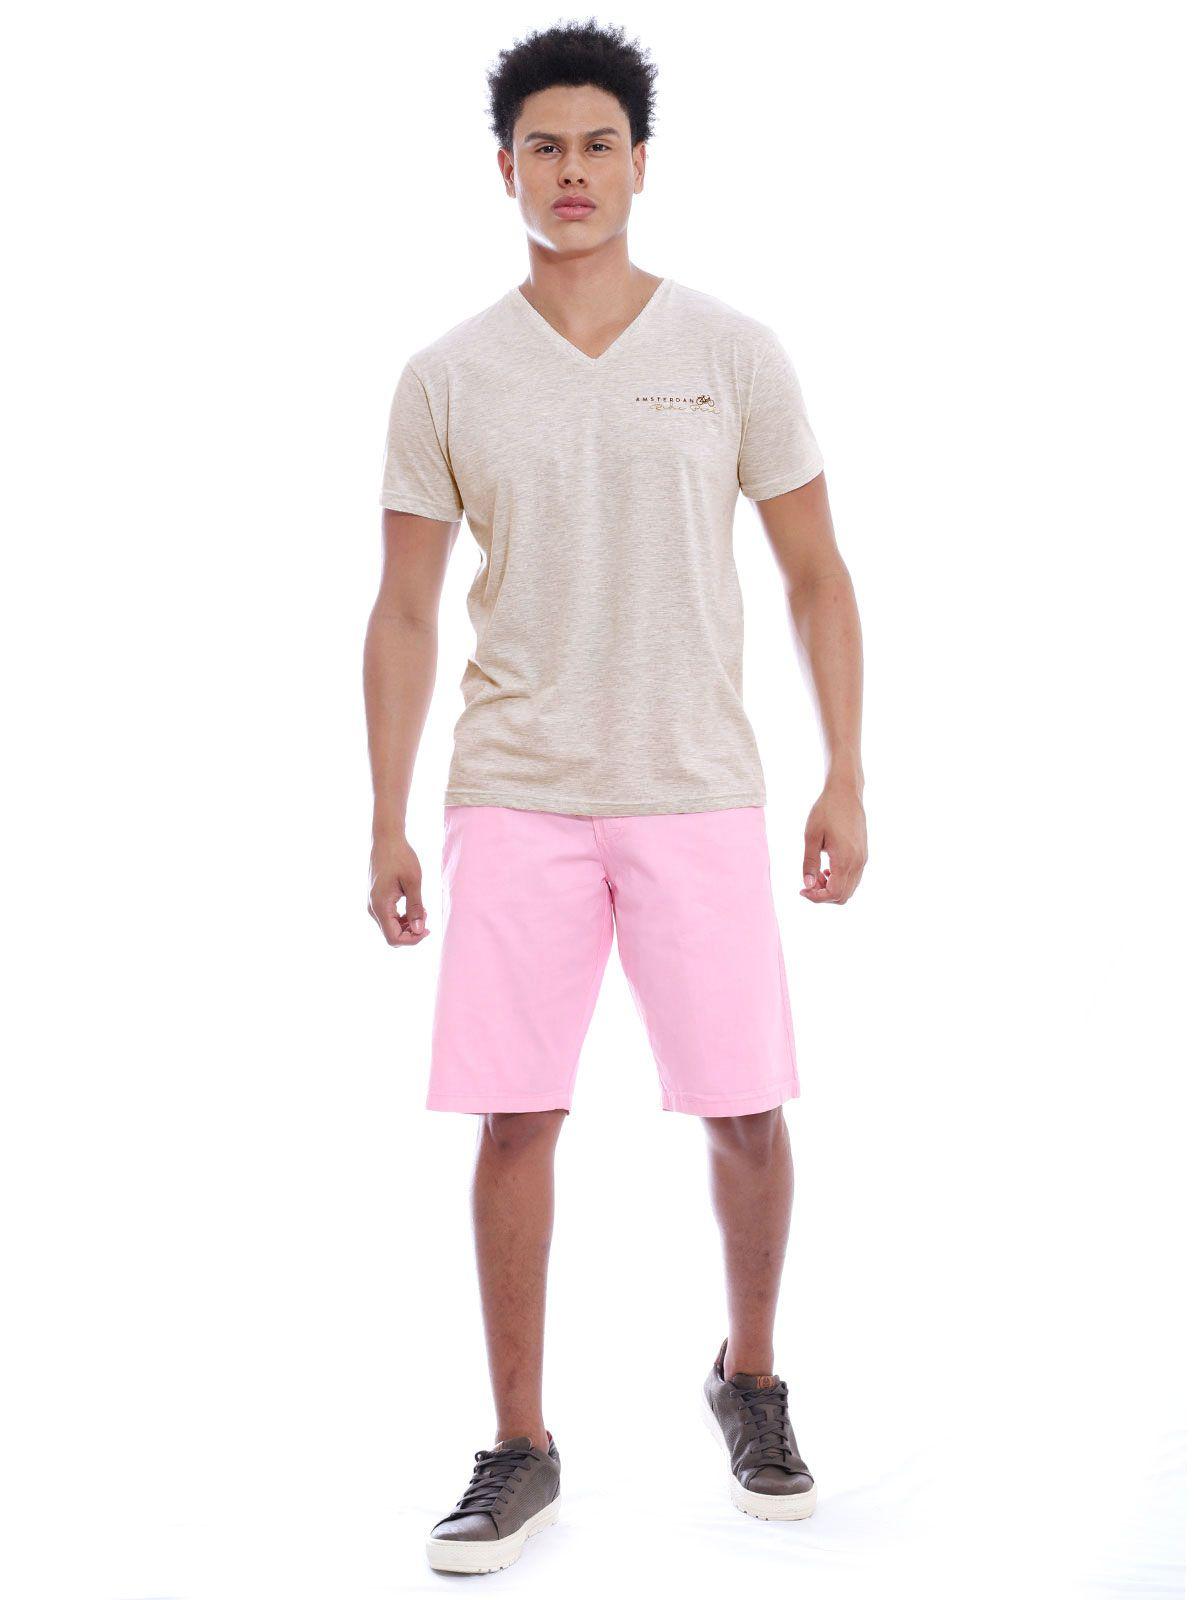 Camiseta Anistia Slim Fit Decote V. Amsterdan Mescla Cru